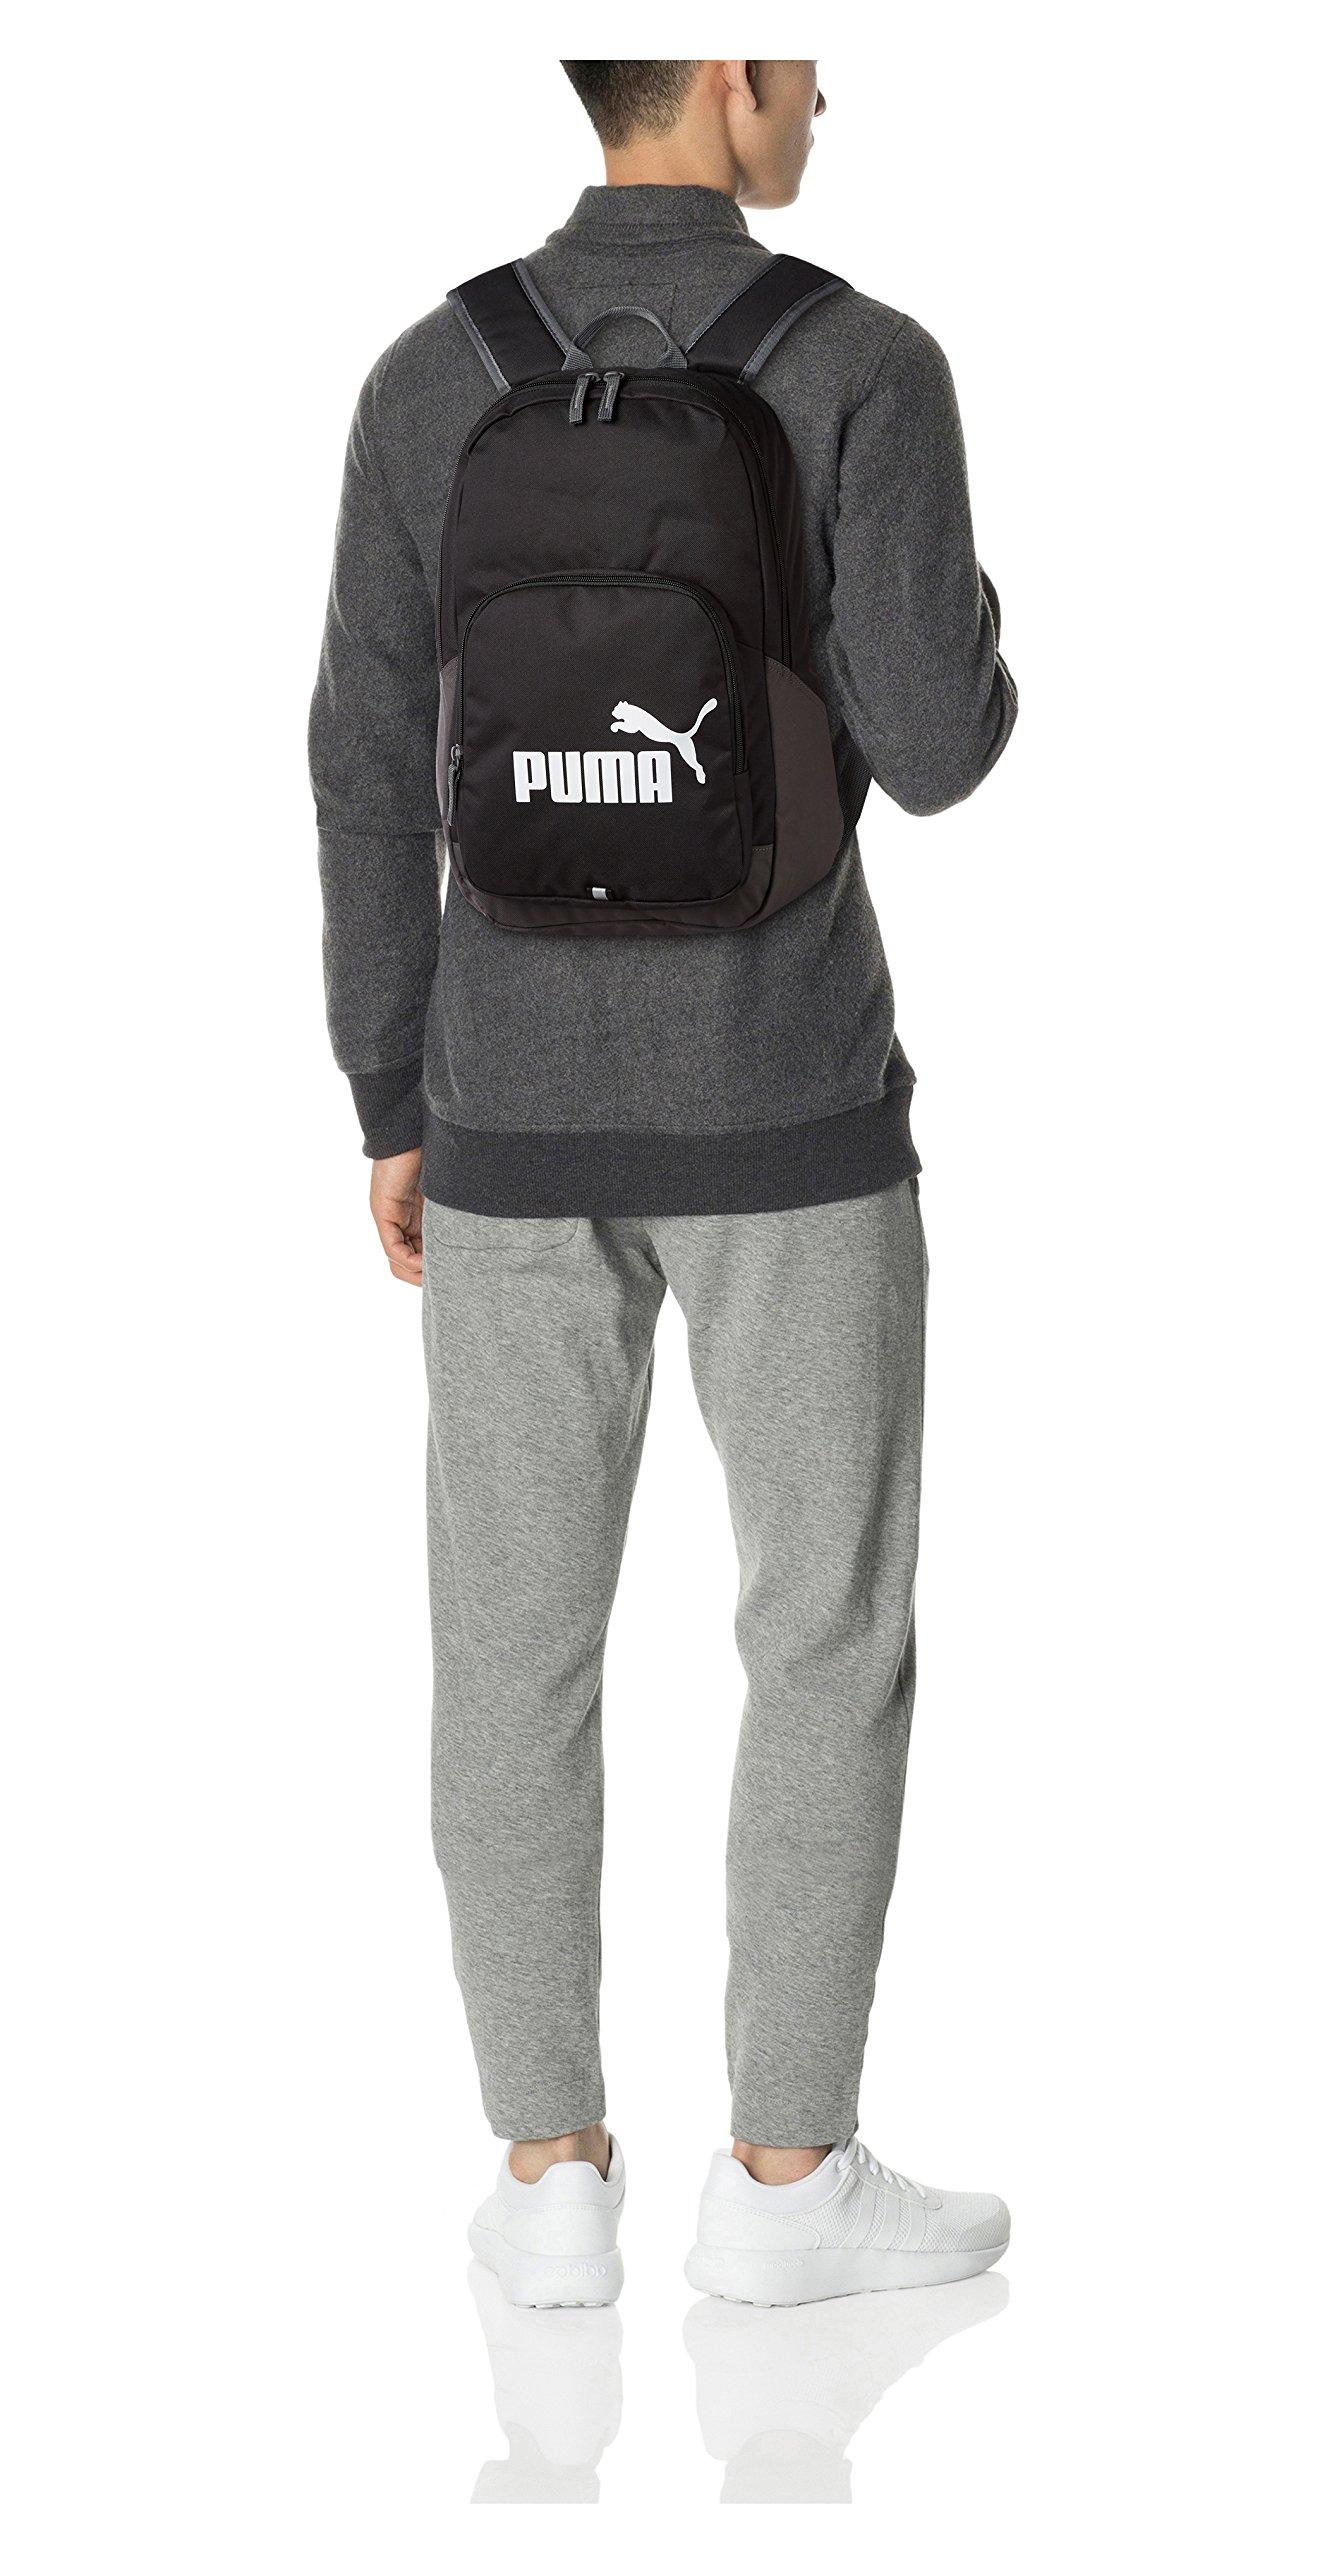 Puma Backpack – Mochila